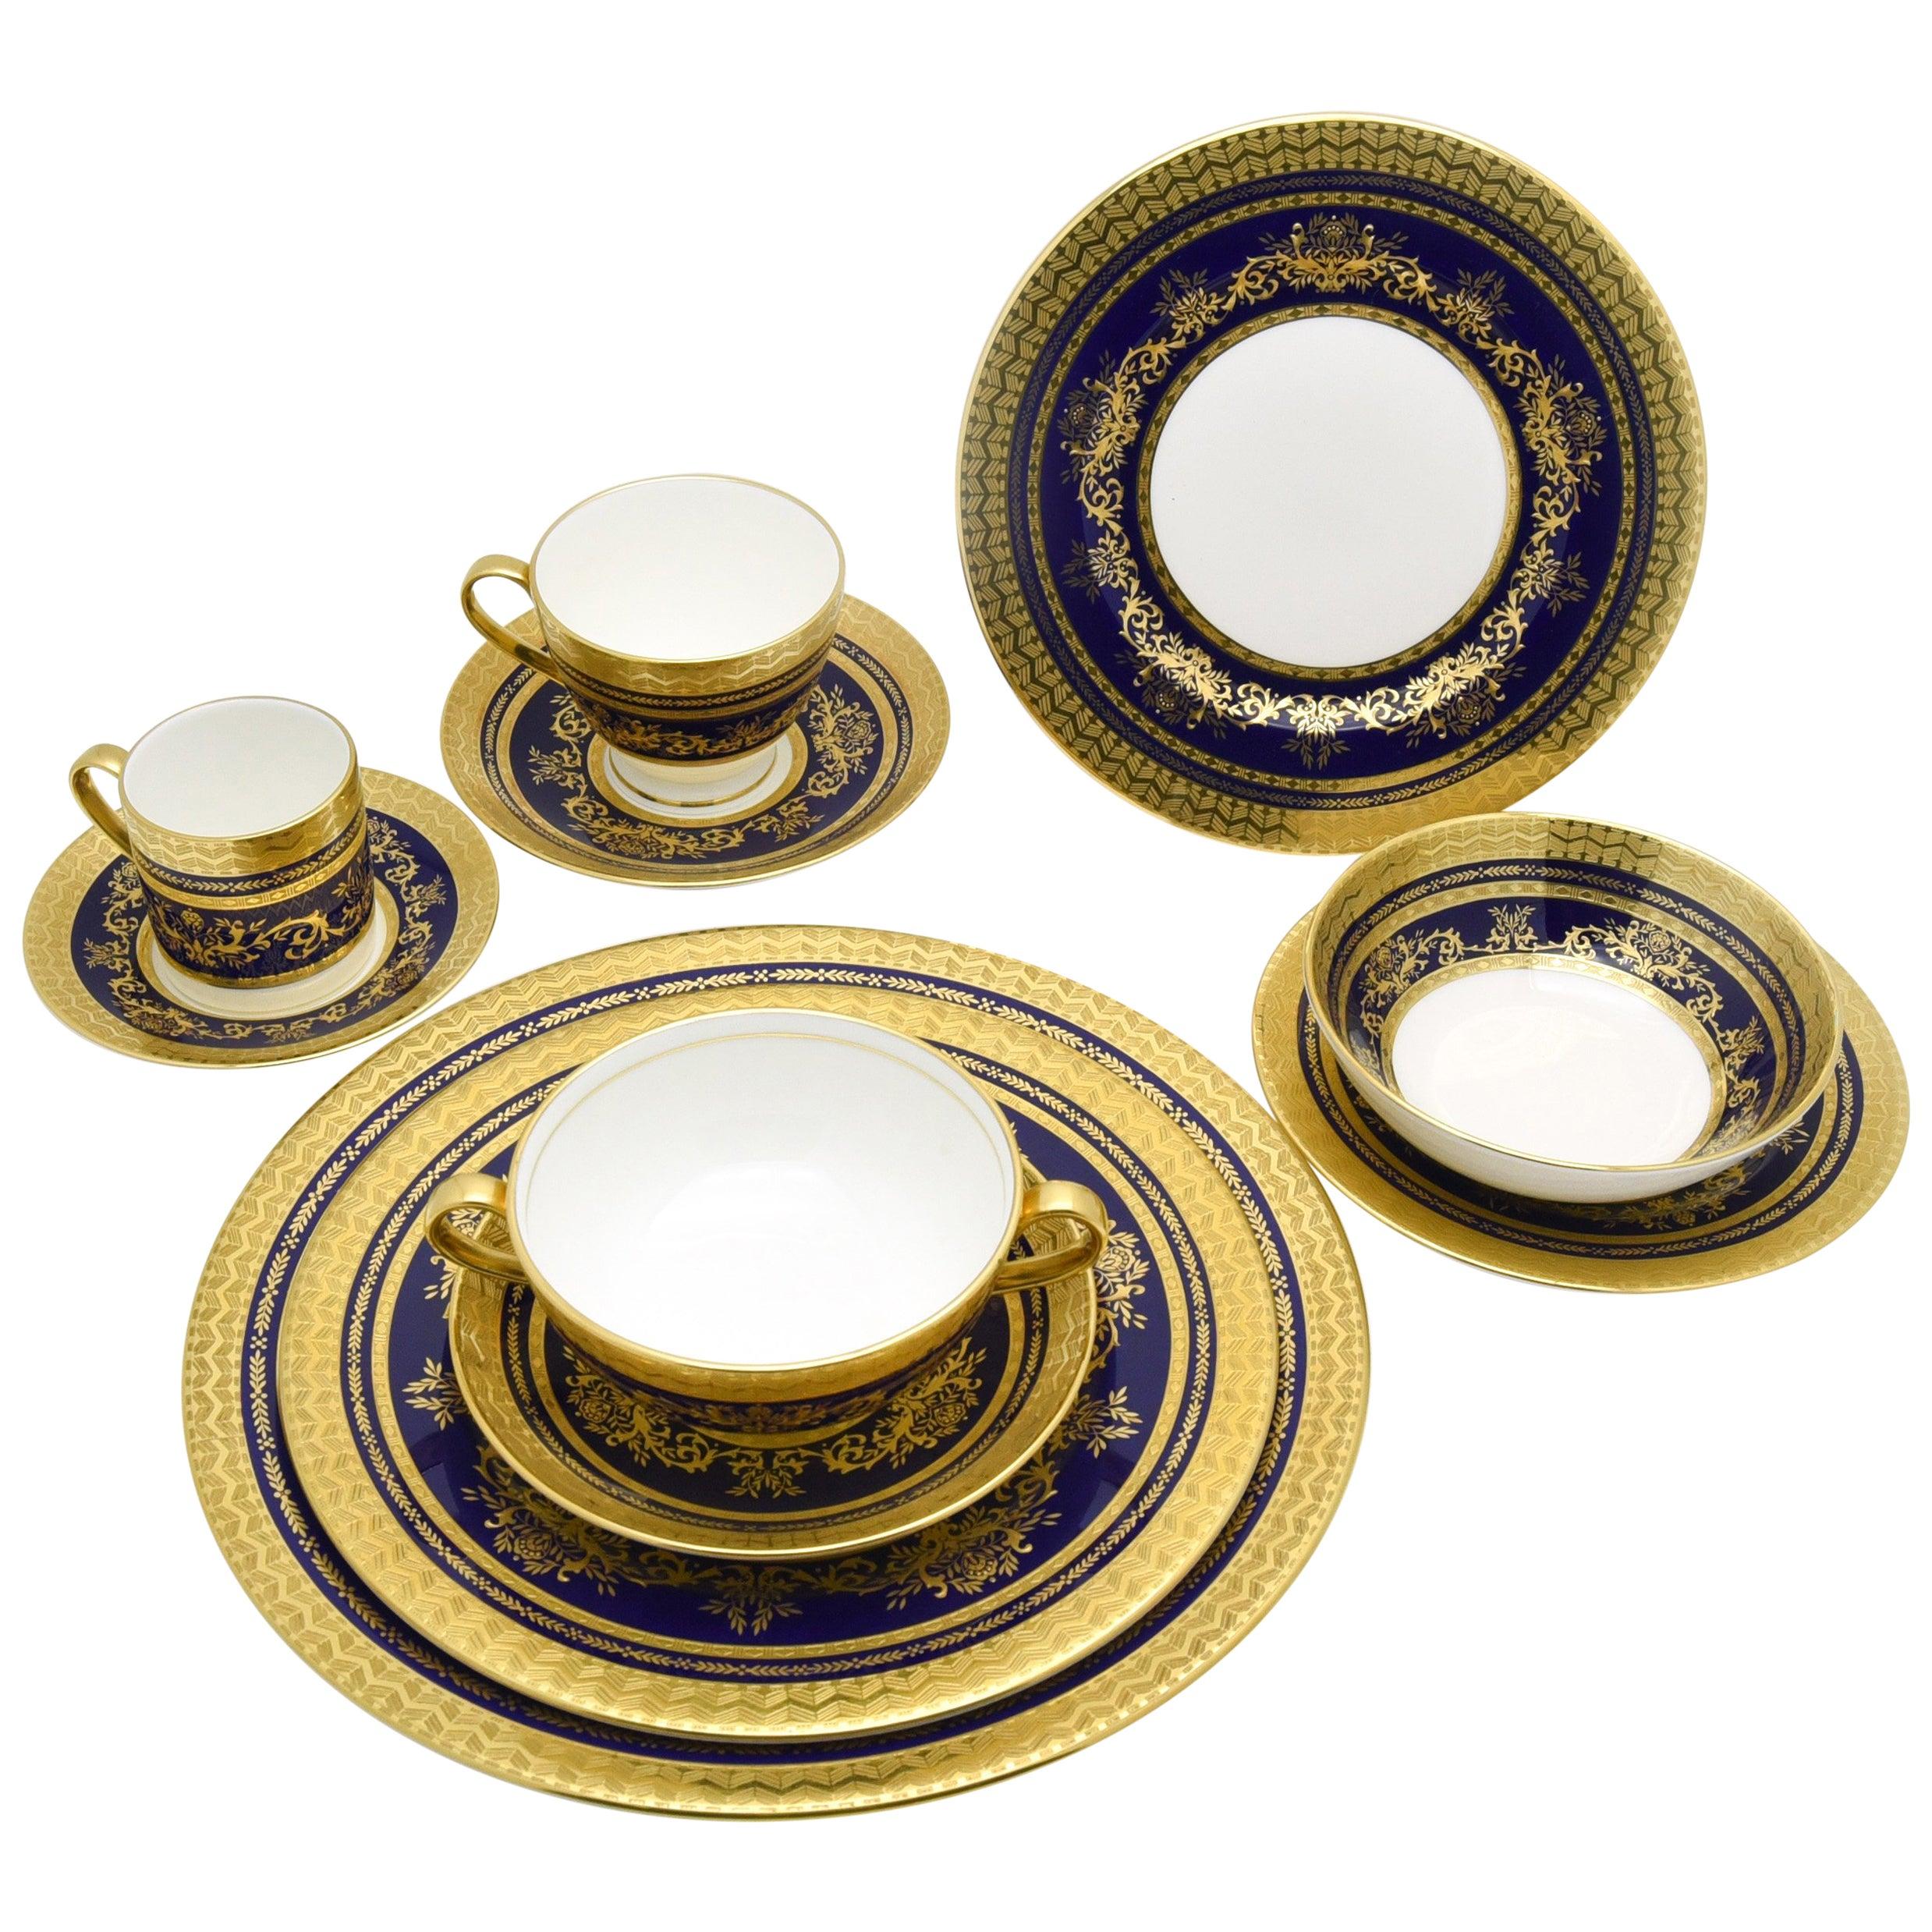 Minton Extensive Pristine Dinner Service Cobalt Blue and Gold 232 Pieces